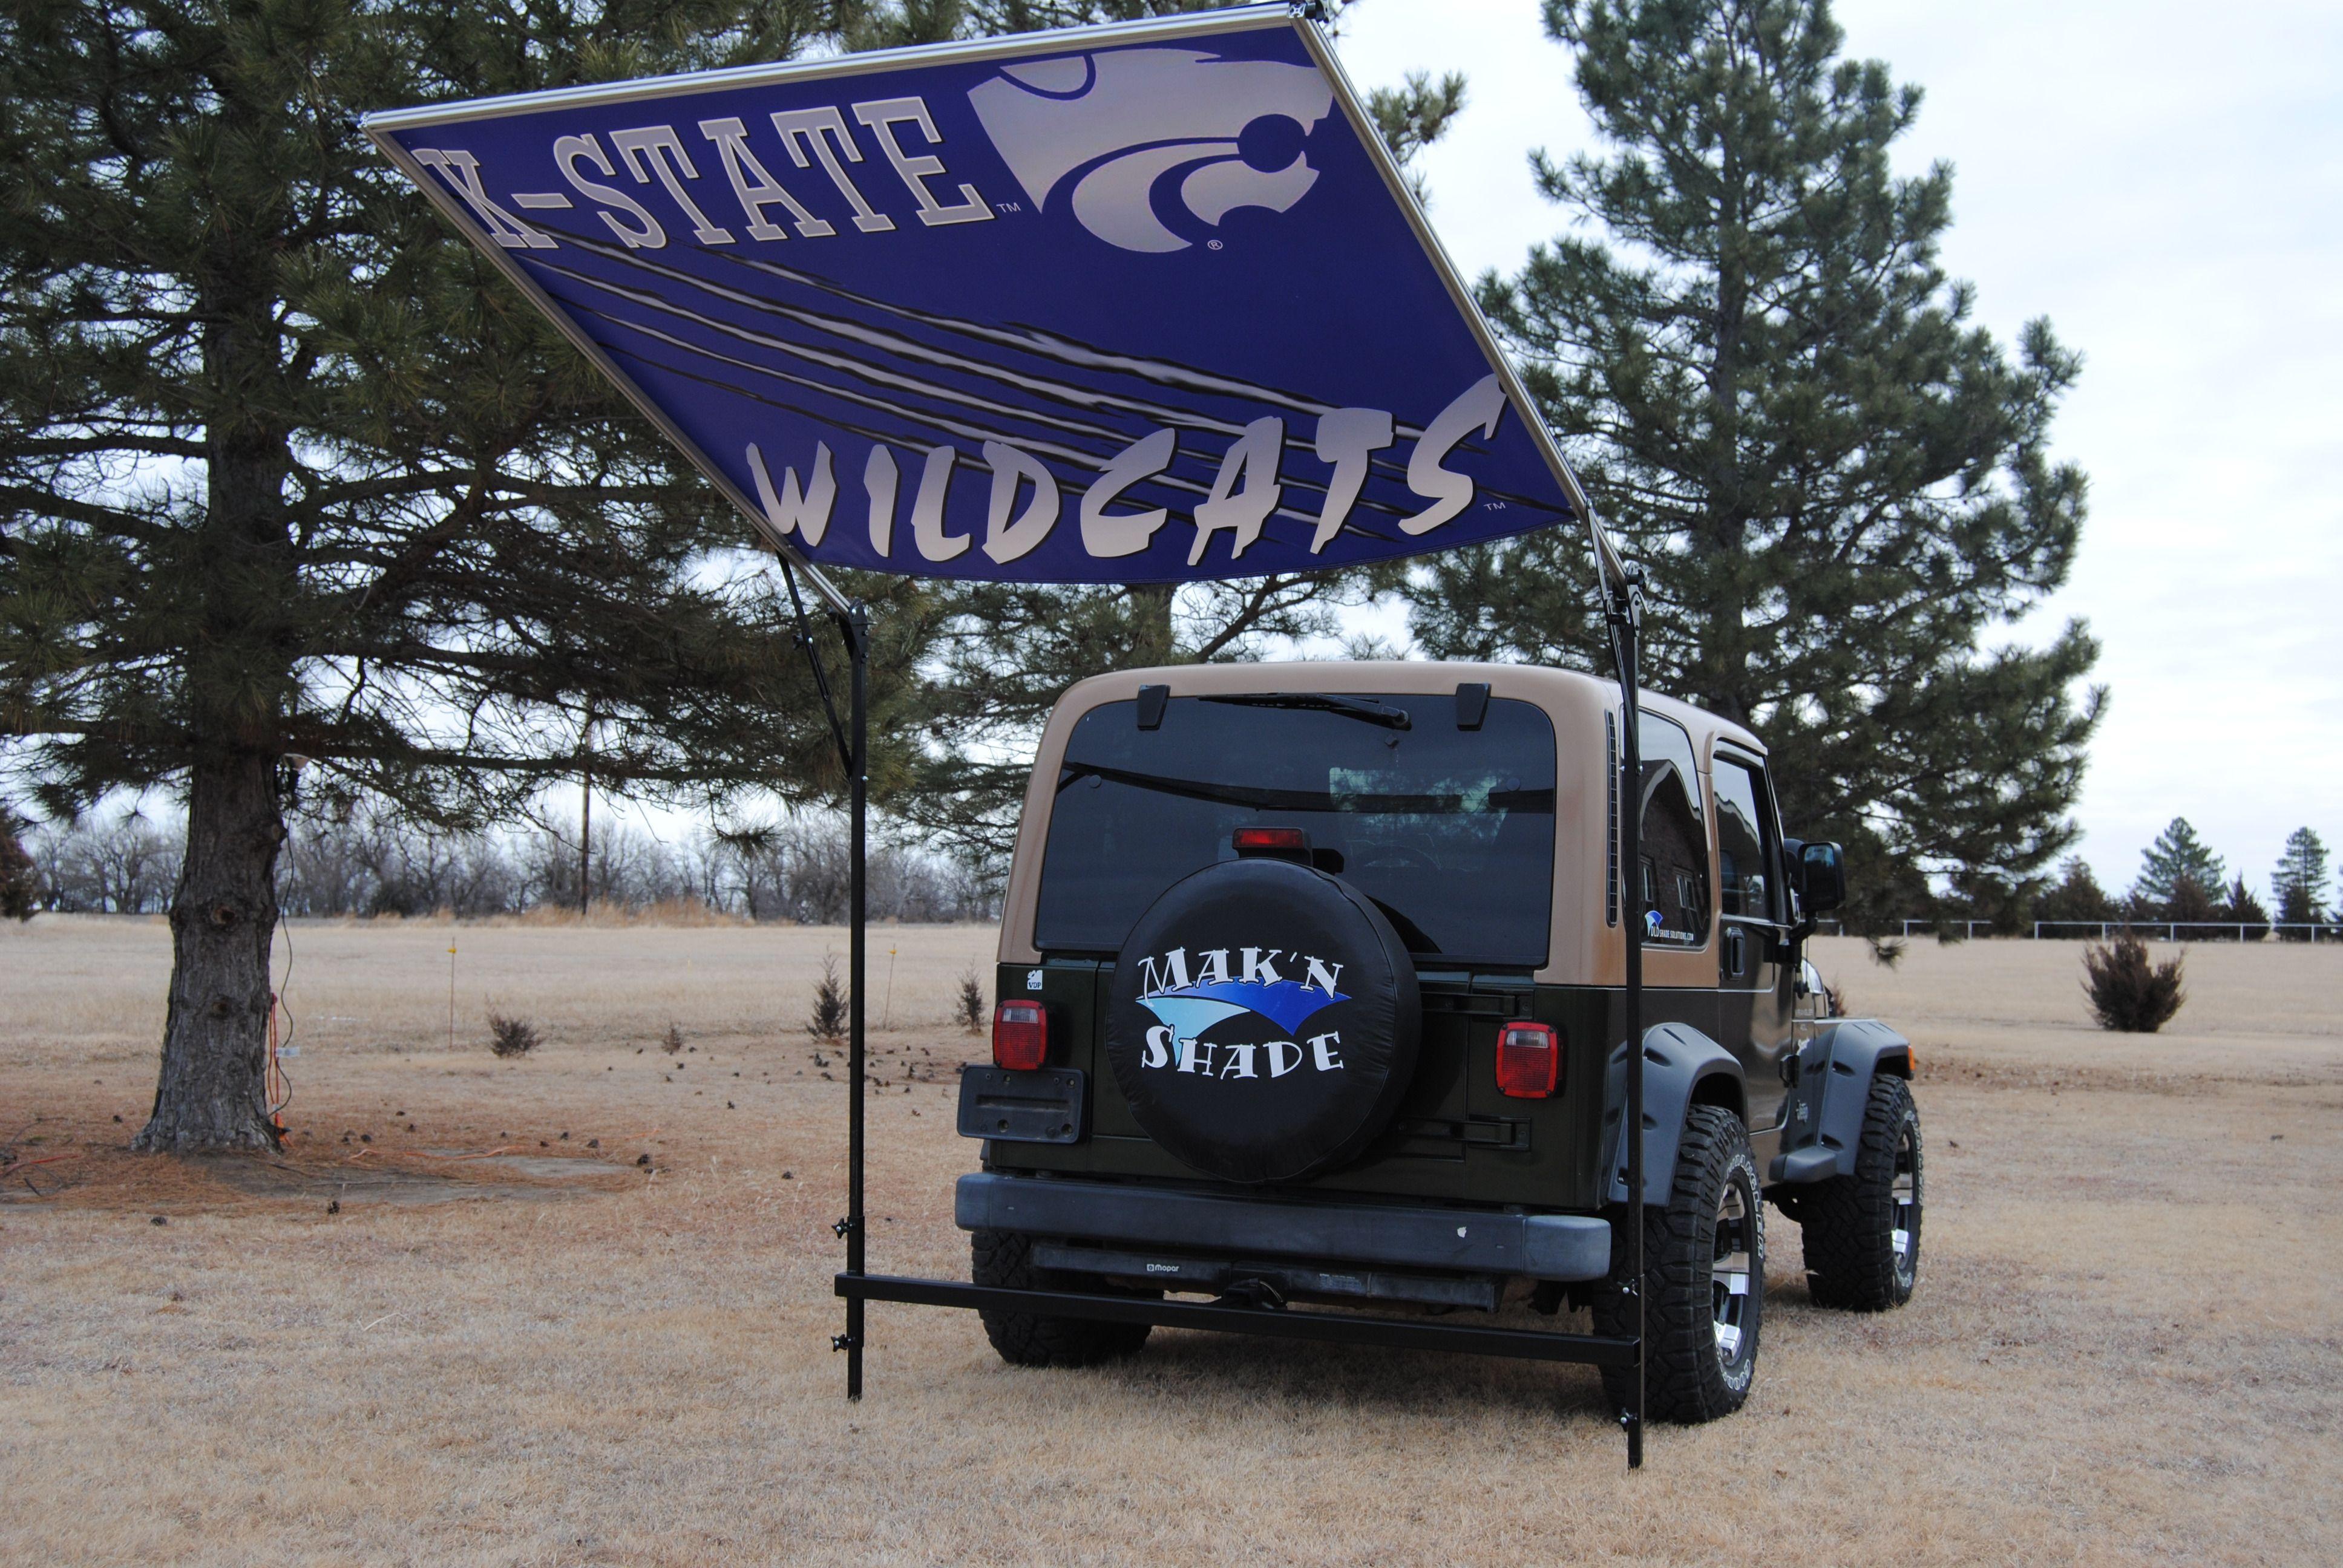 Kansas State University tail-gate shade. #KState   dldshadesolutions.com